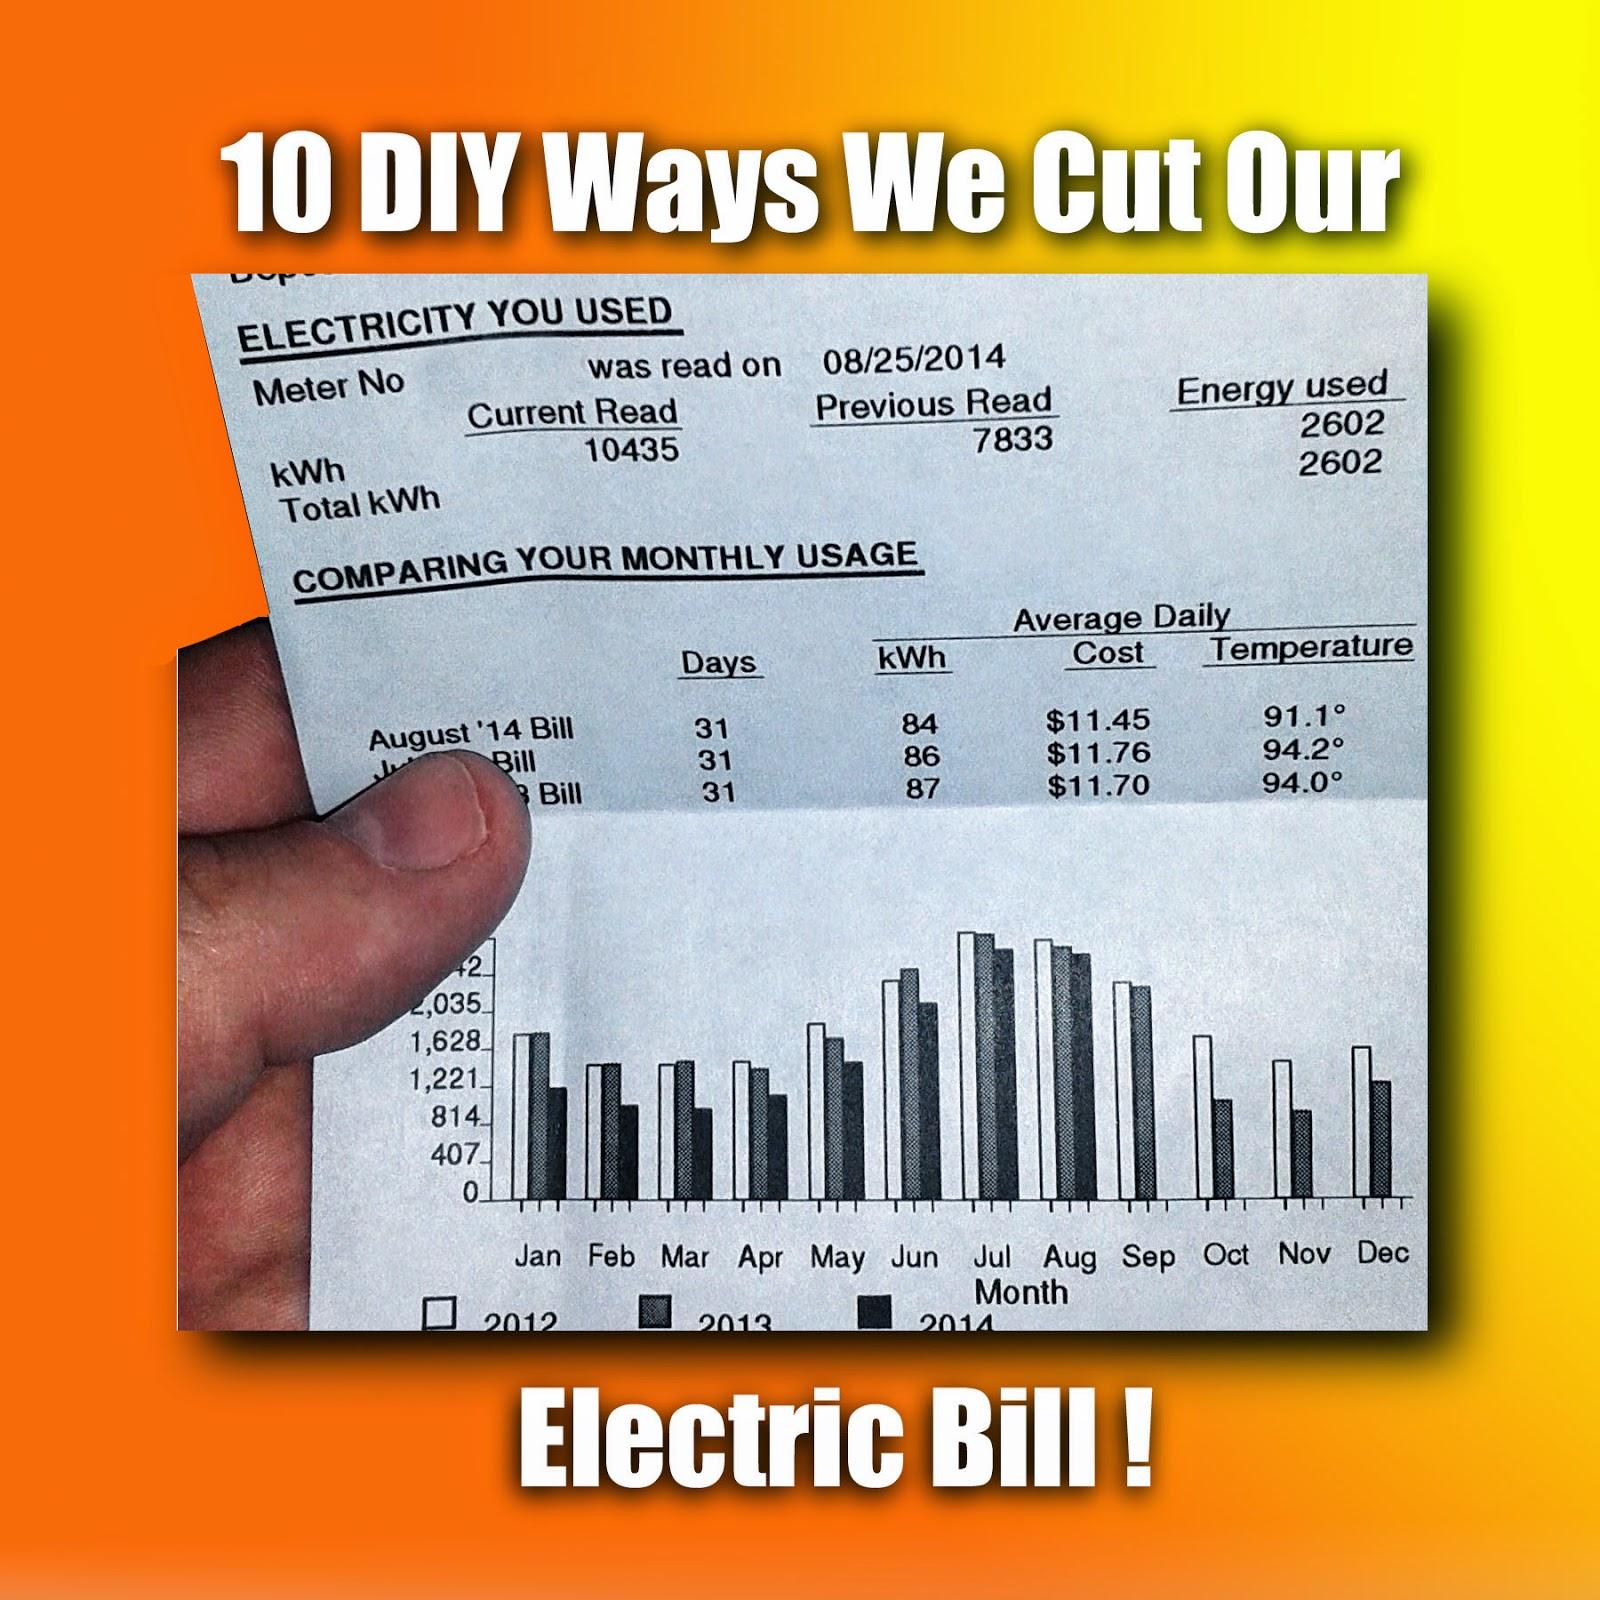 The 10 diy ways we cut our electric bill az diy guy s projects